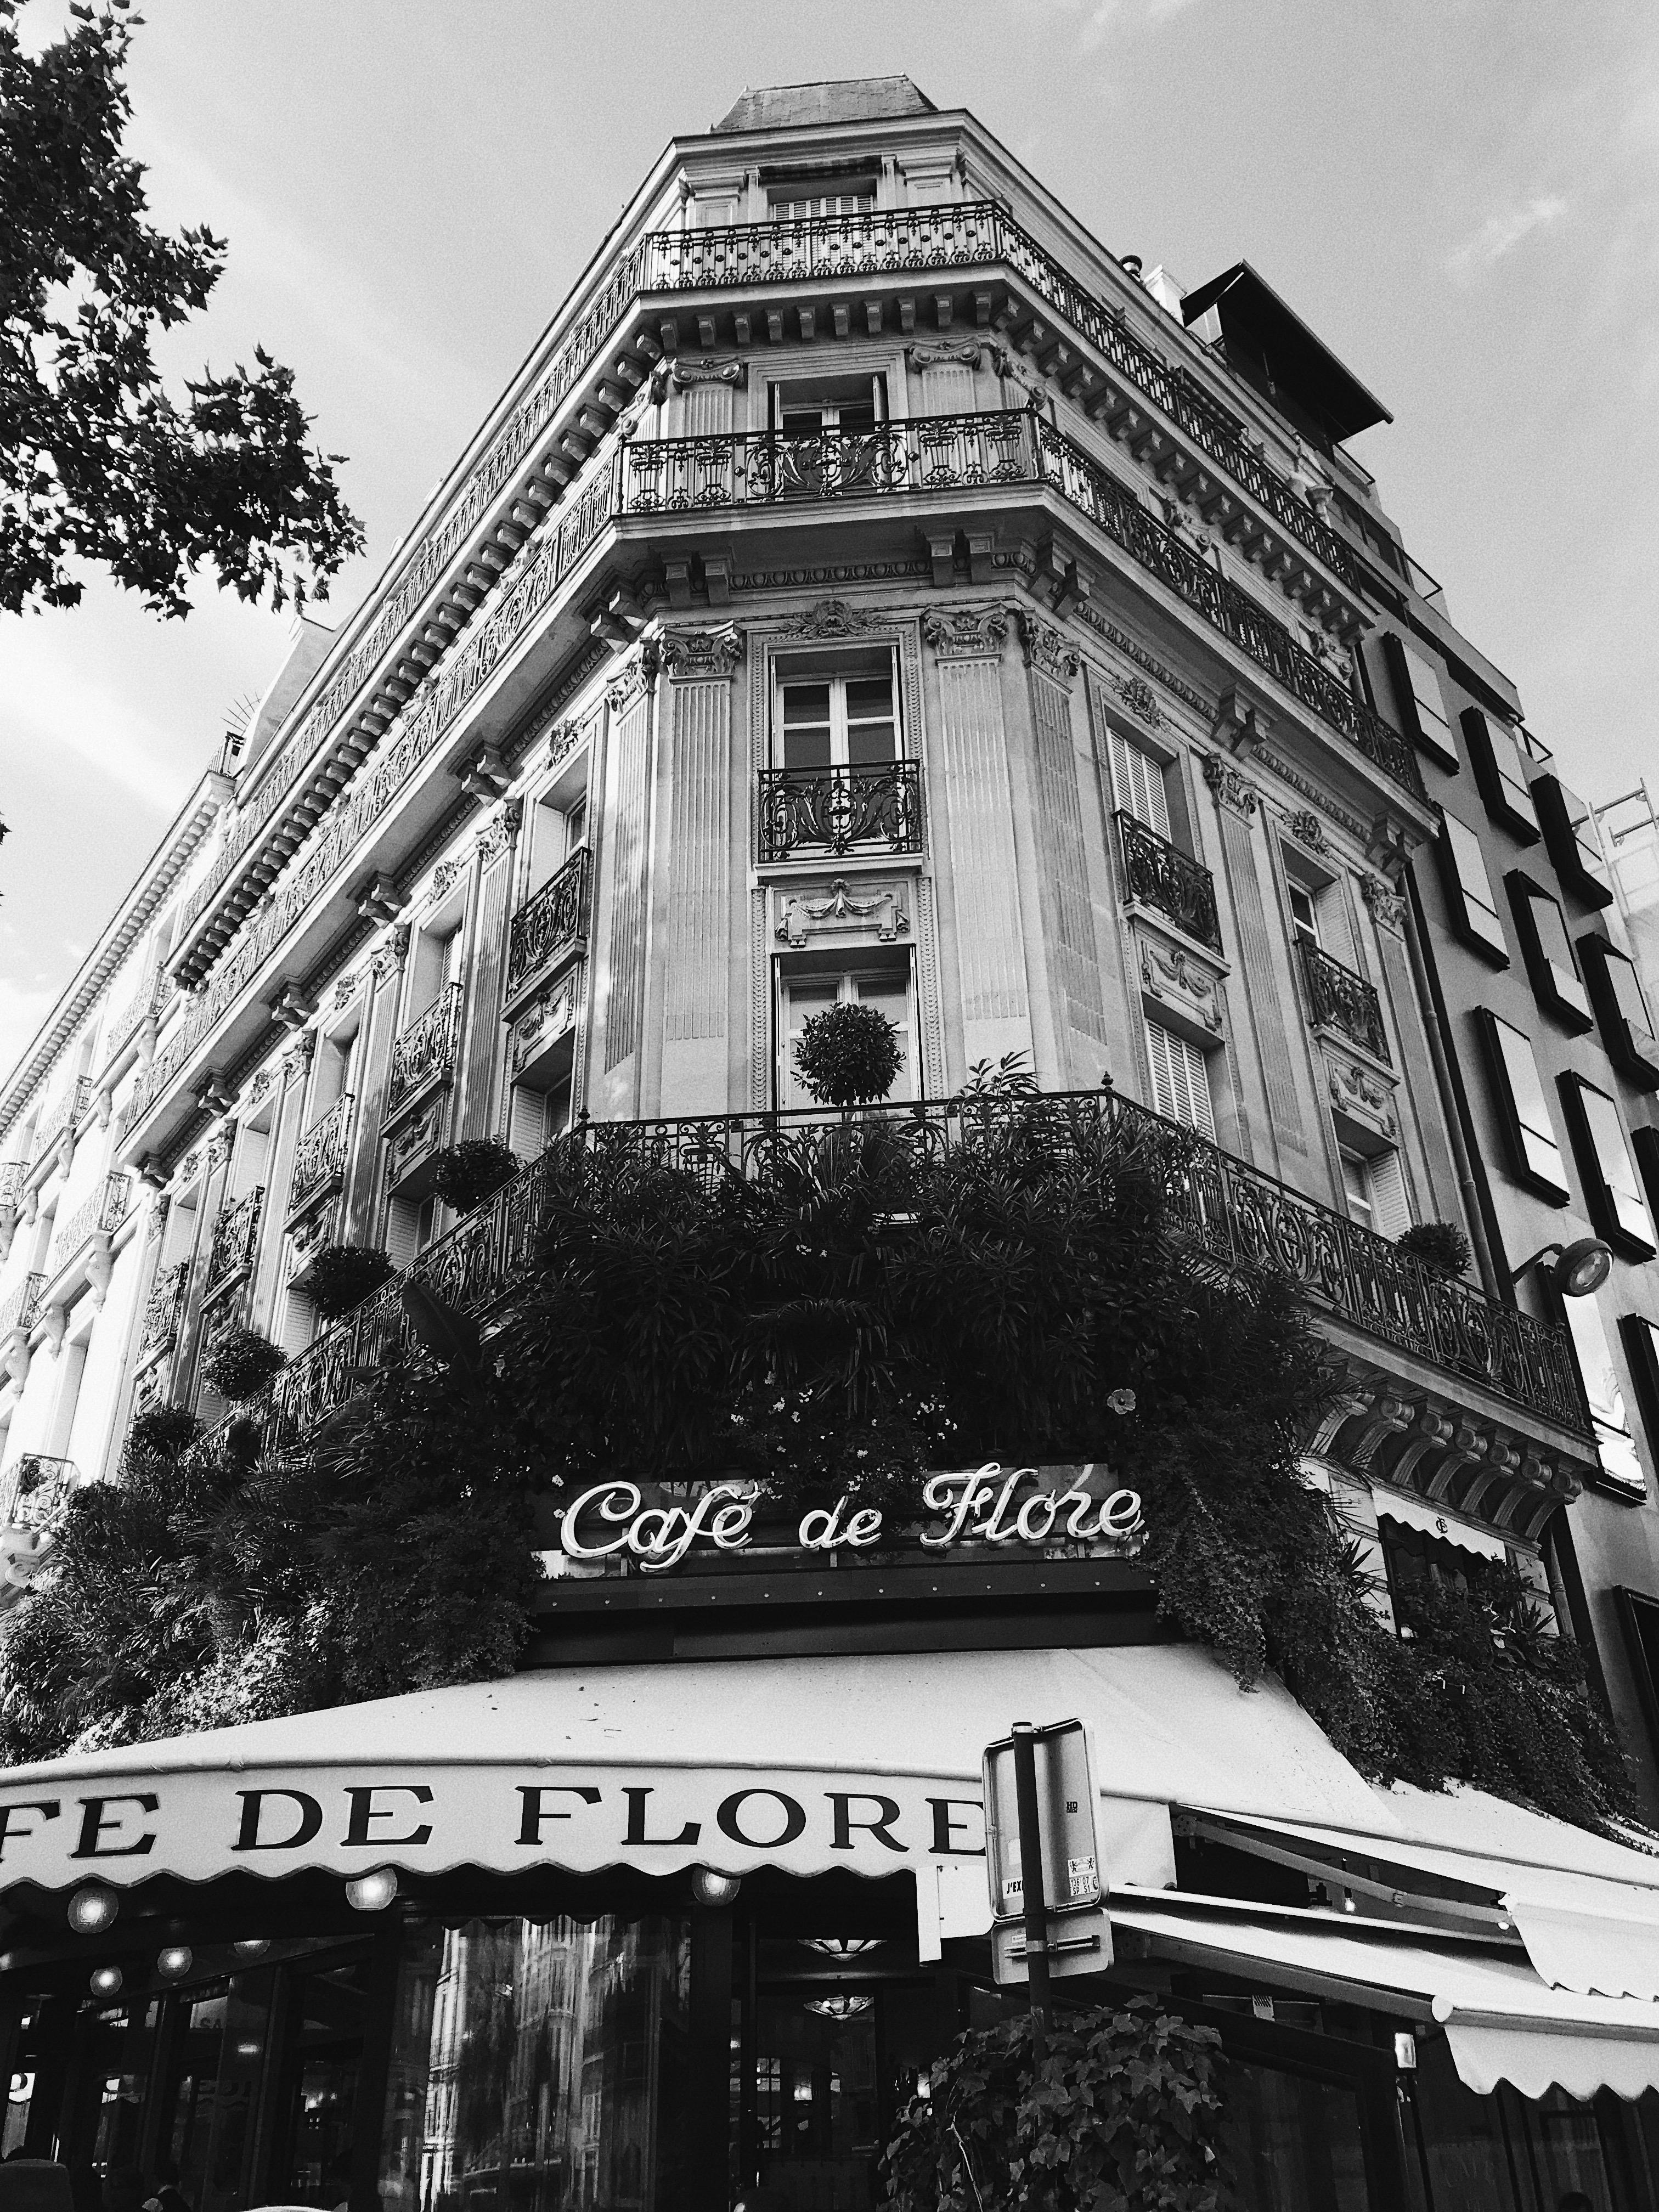 Cafe De Flore Andiataandiata - Fotos-de-flore